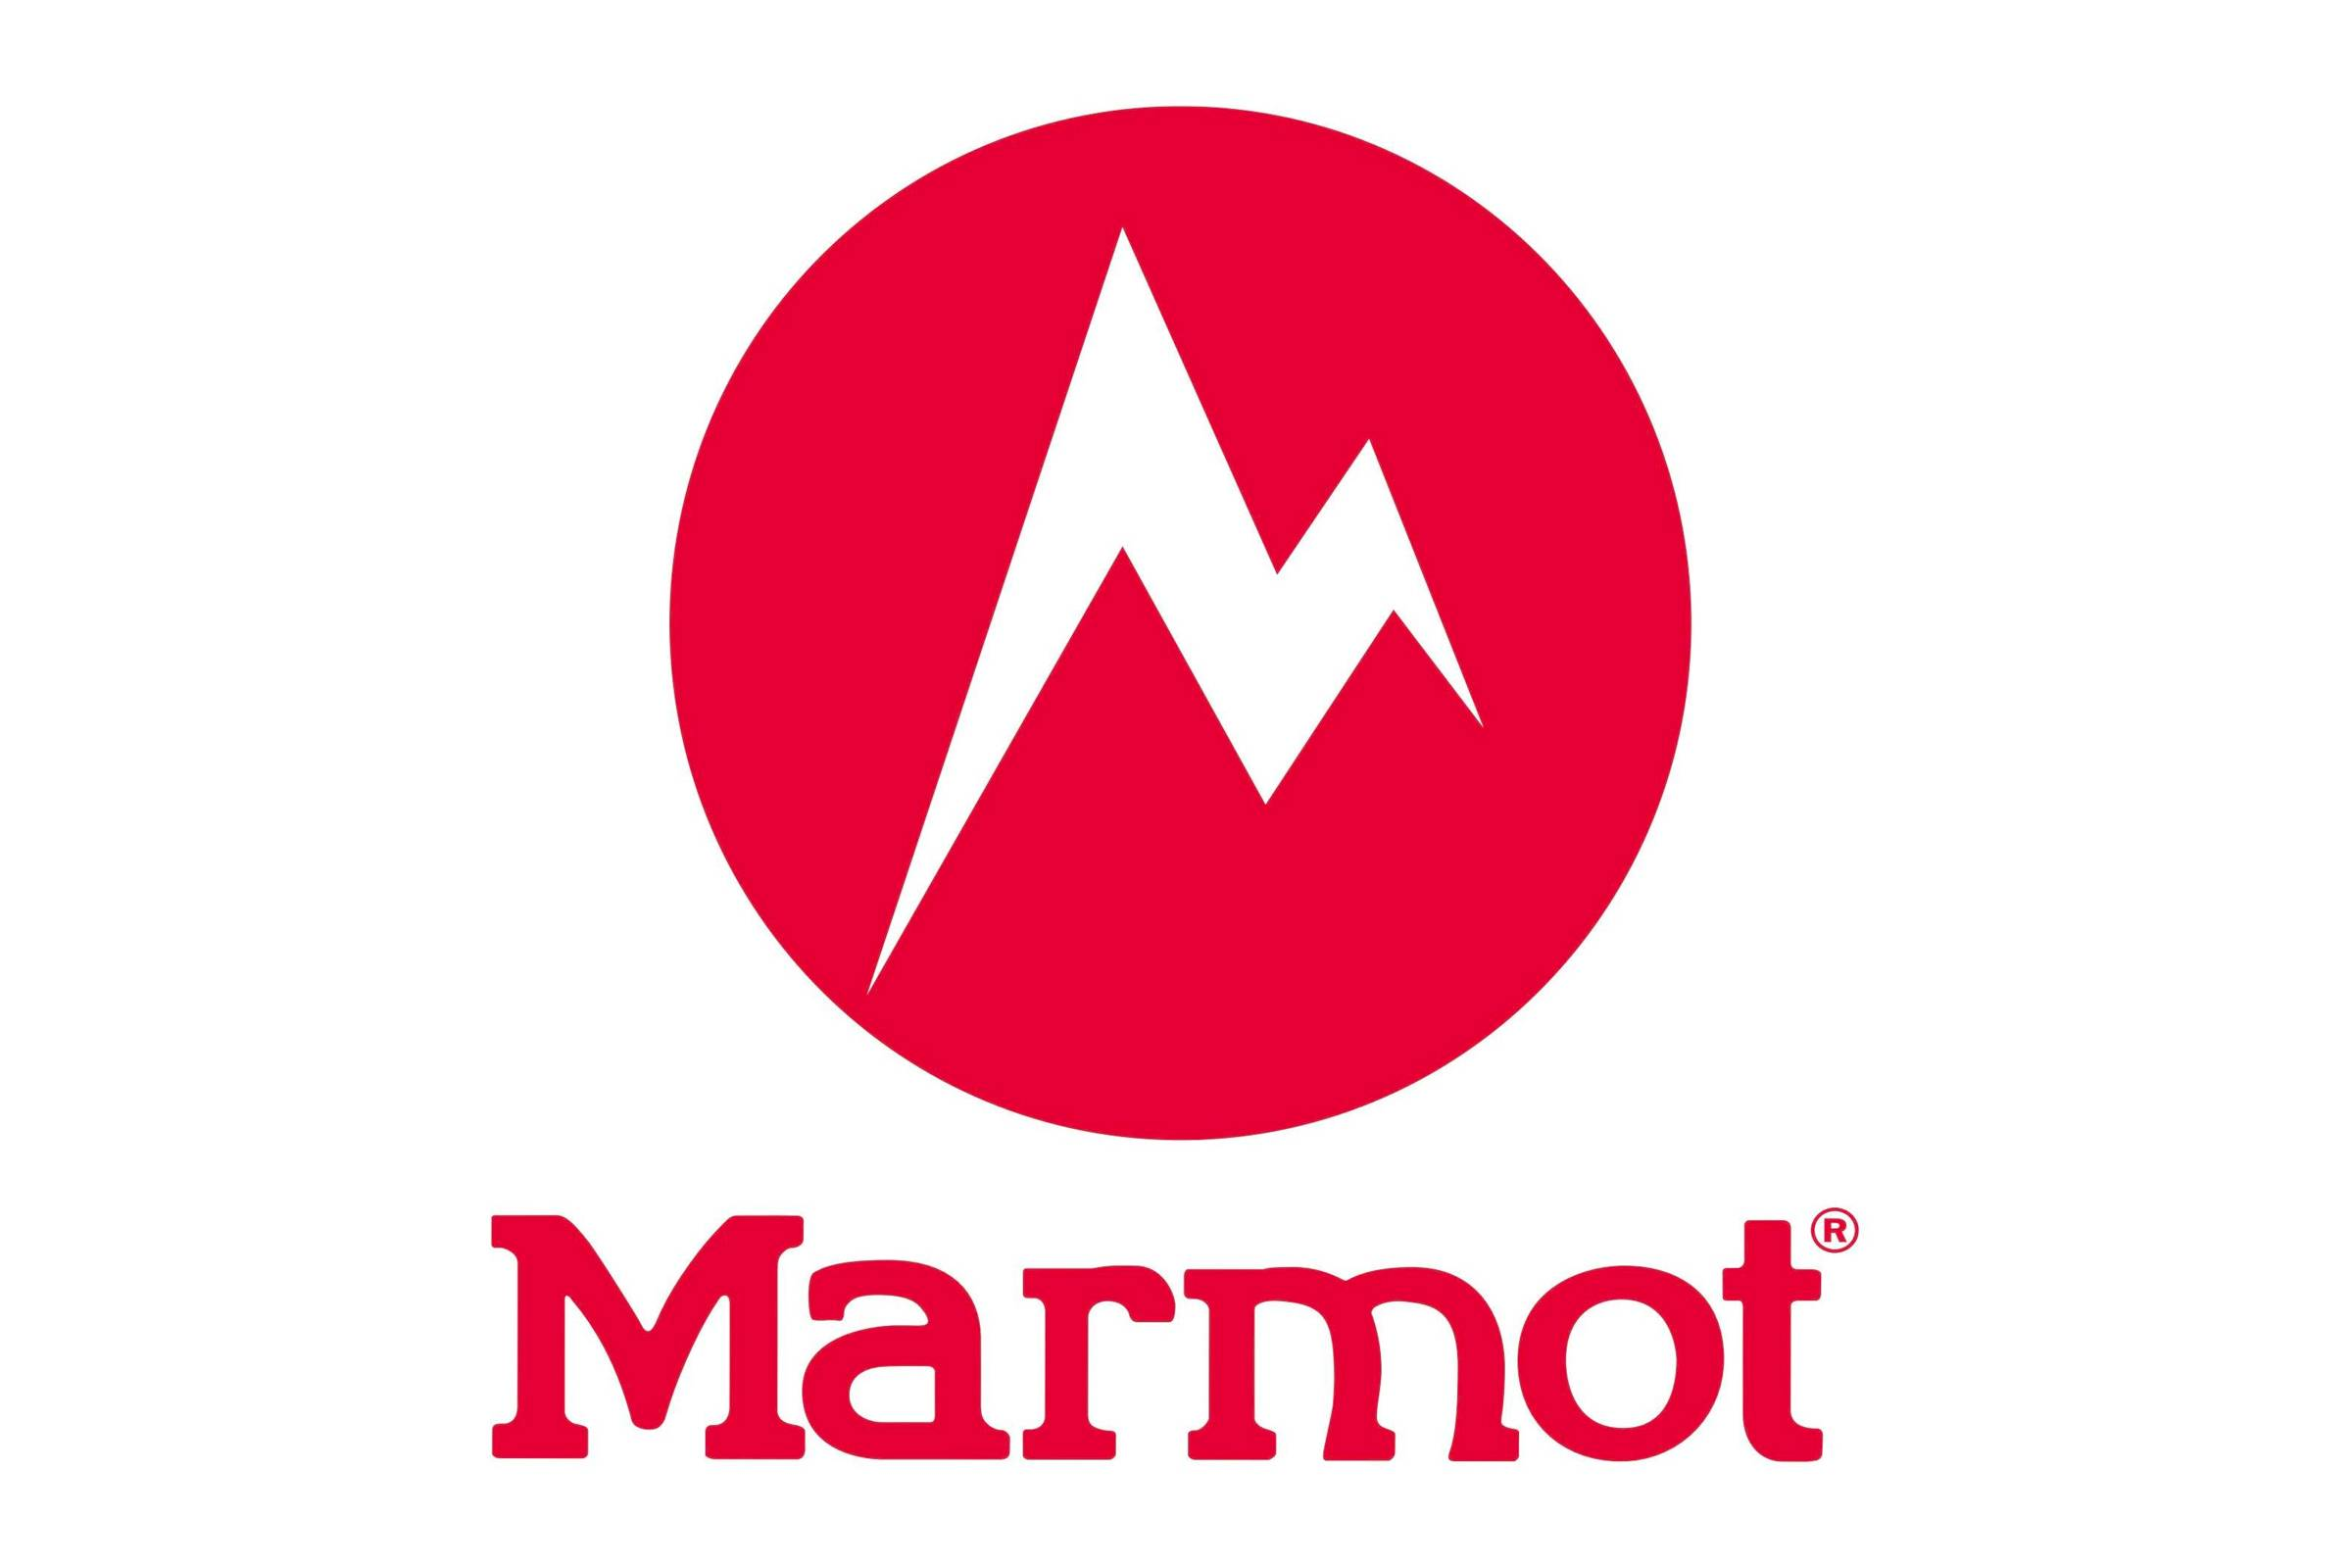 8. Marmot